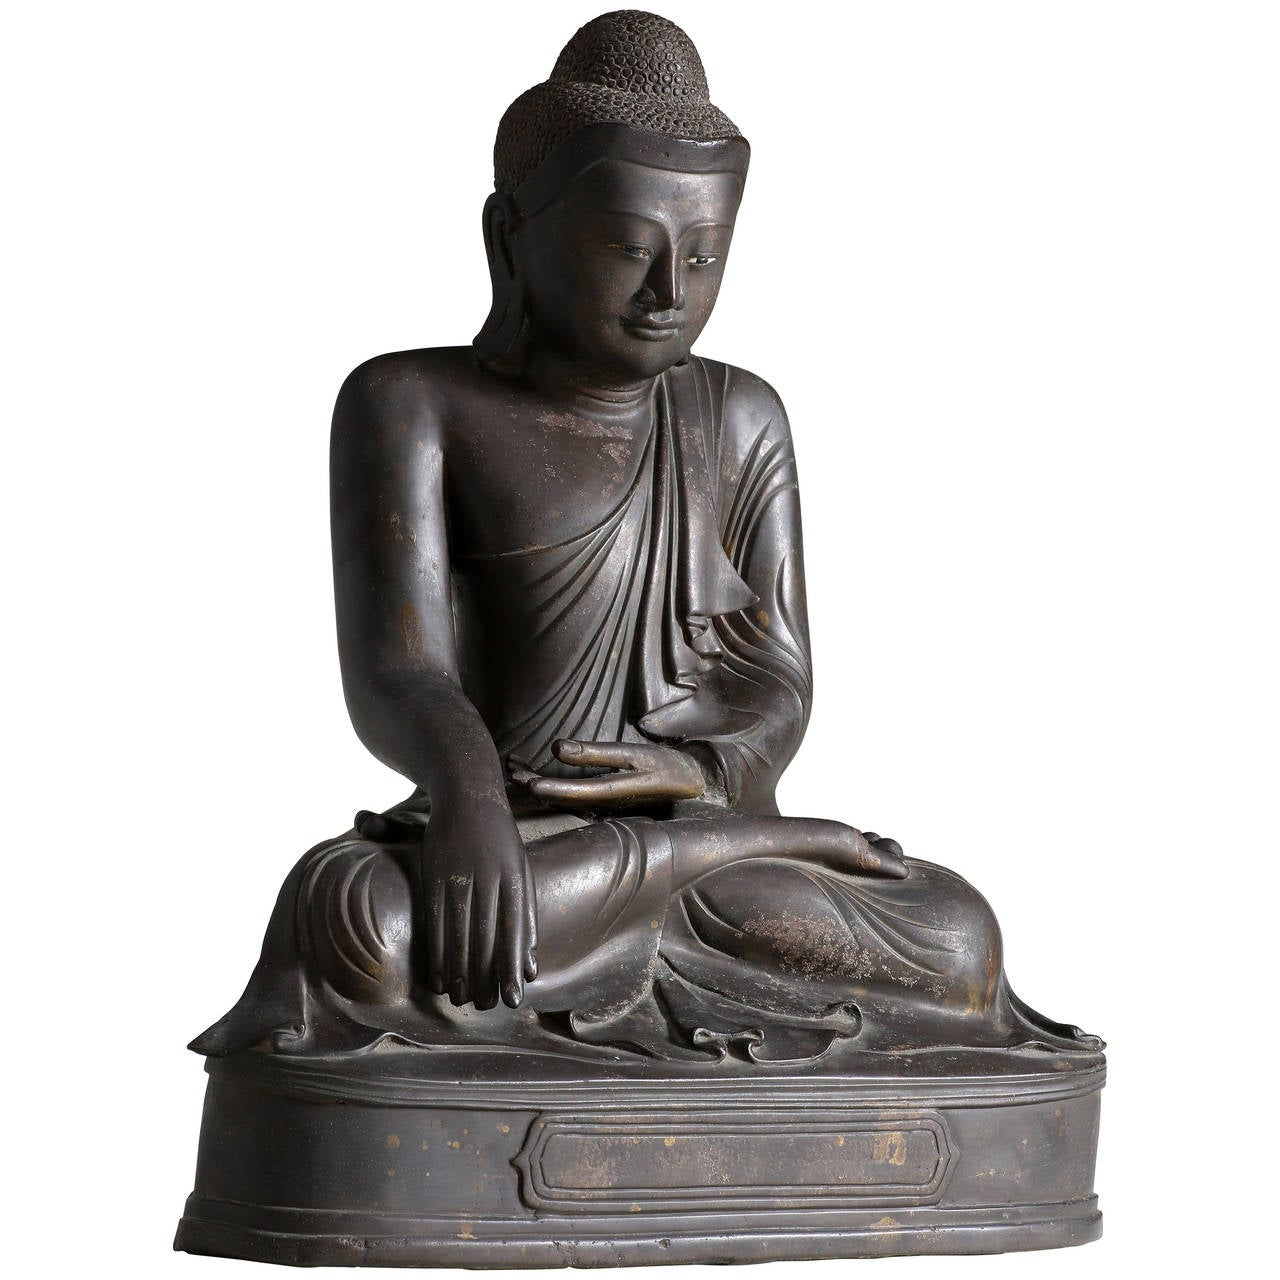 Antique burmese bronze seated buddha sculpture mandalay style at antique burmese bronze seated buddha sculpture mandalay style for sale buycottarizona